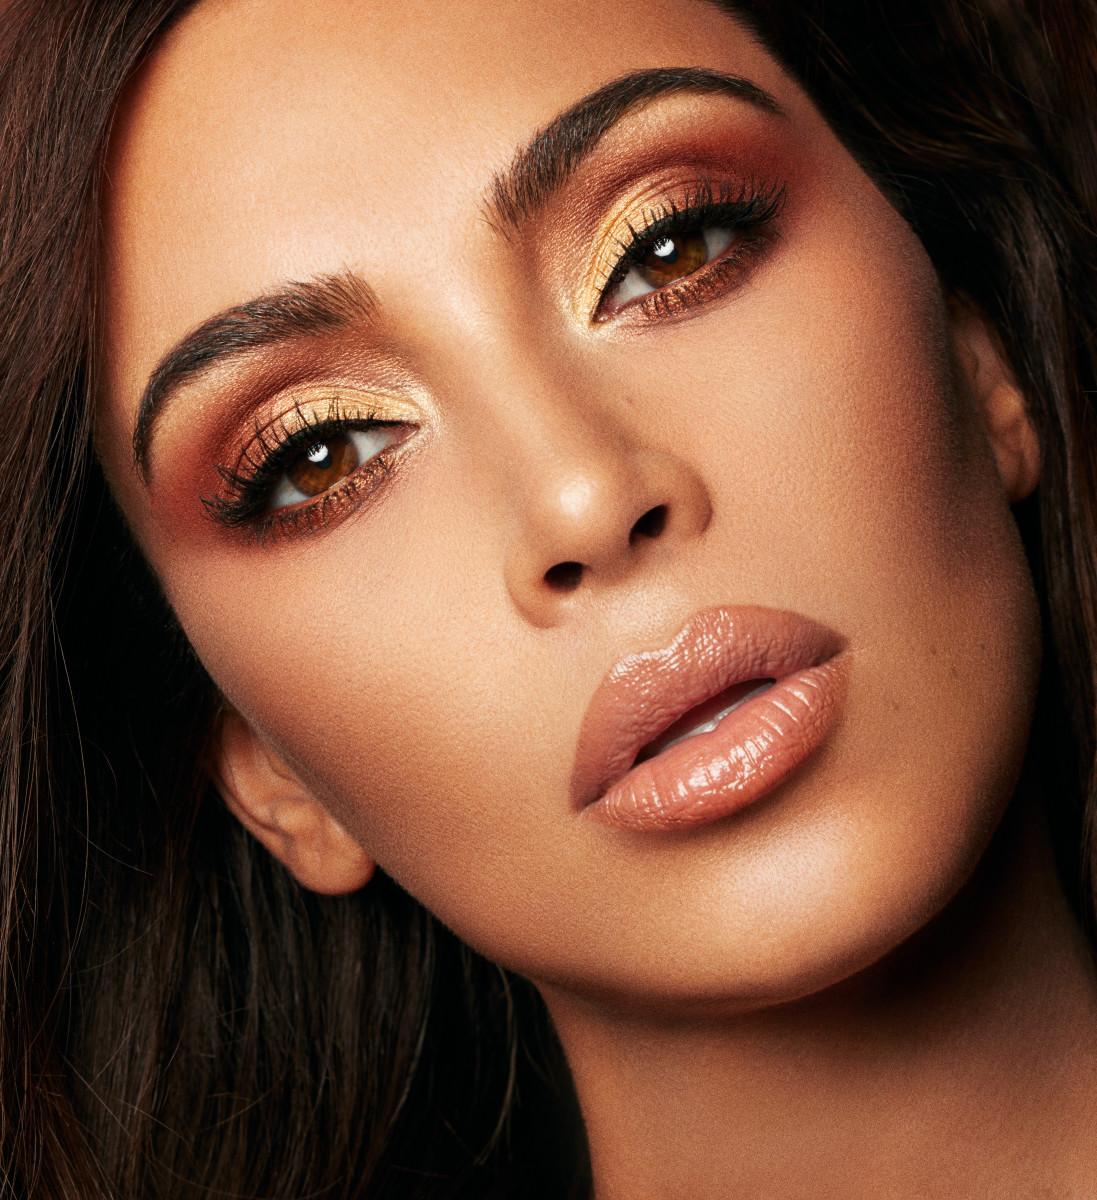 Kim Kardashian for KKW Beauty.Photo: Greg Swales/KKW Beauty